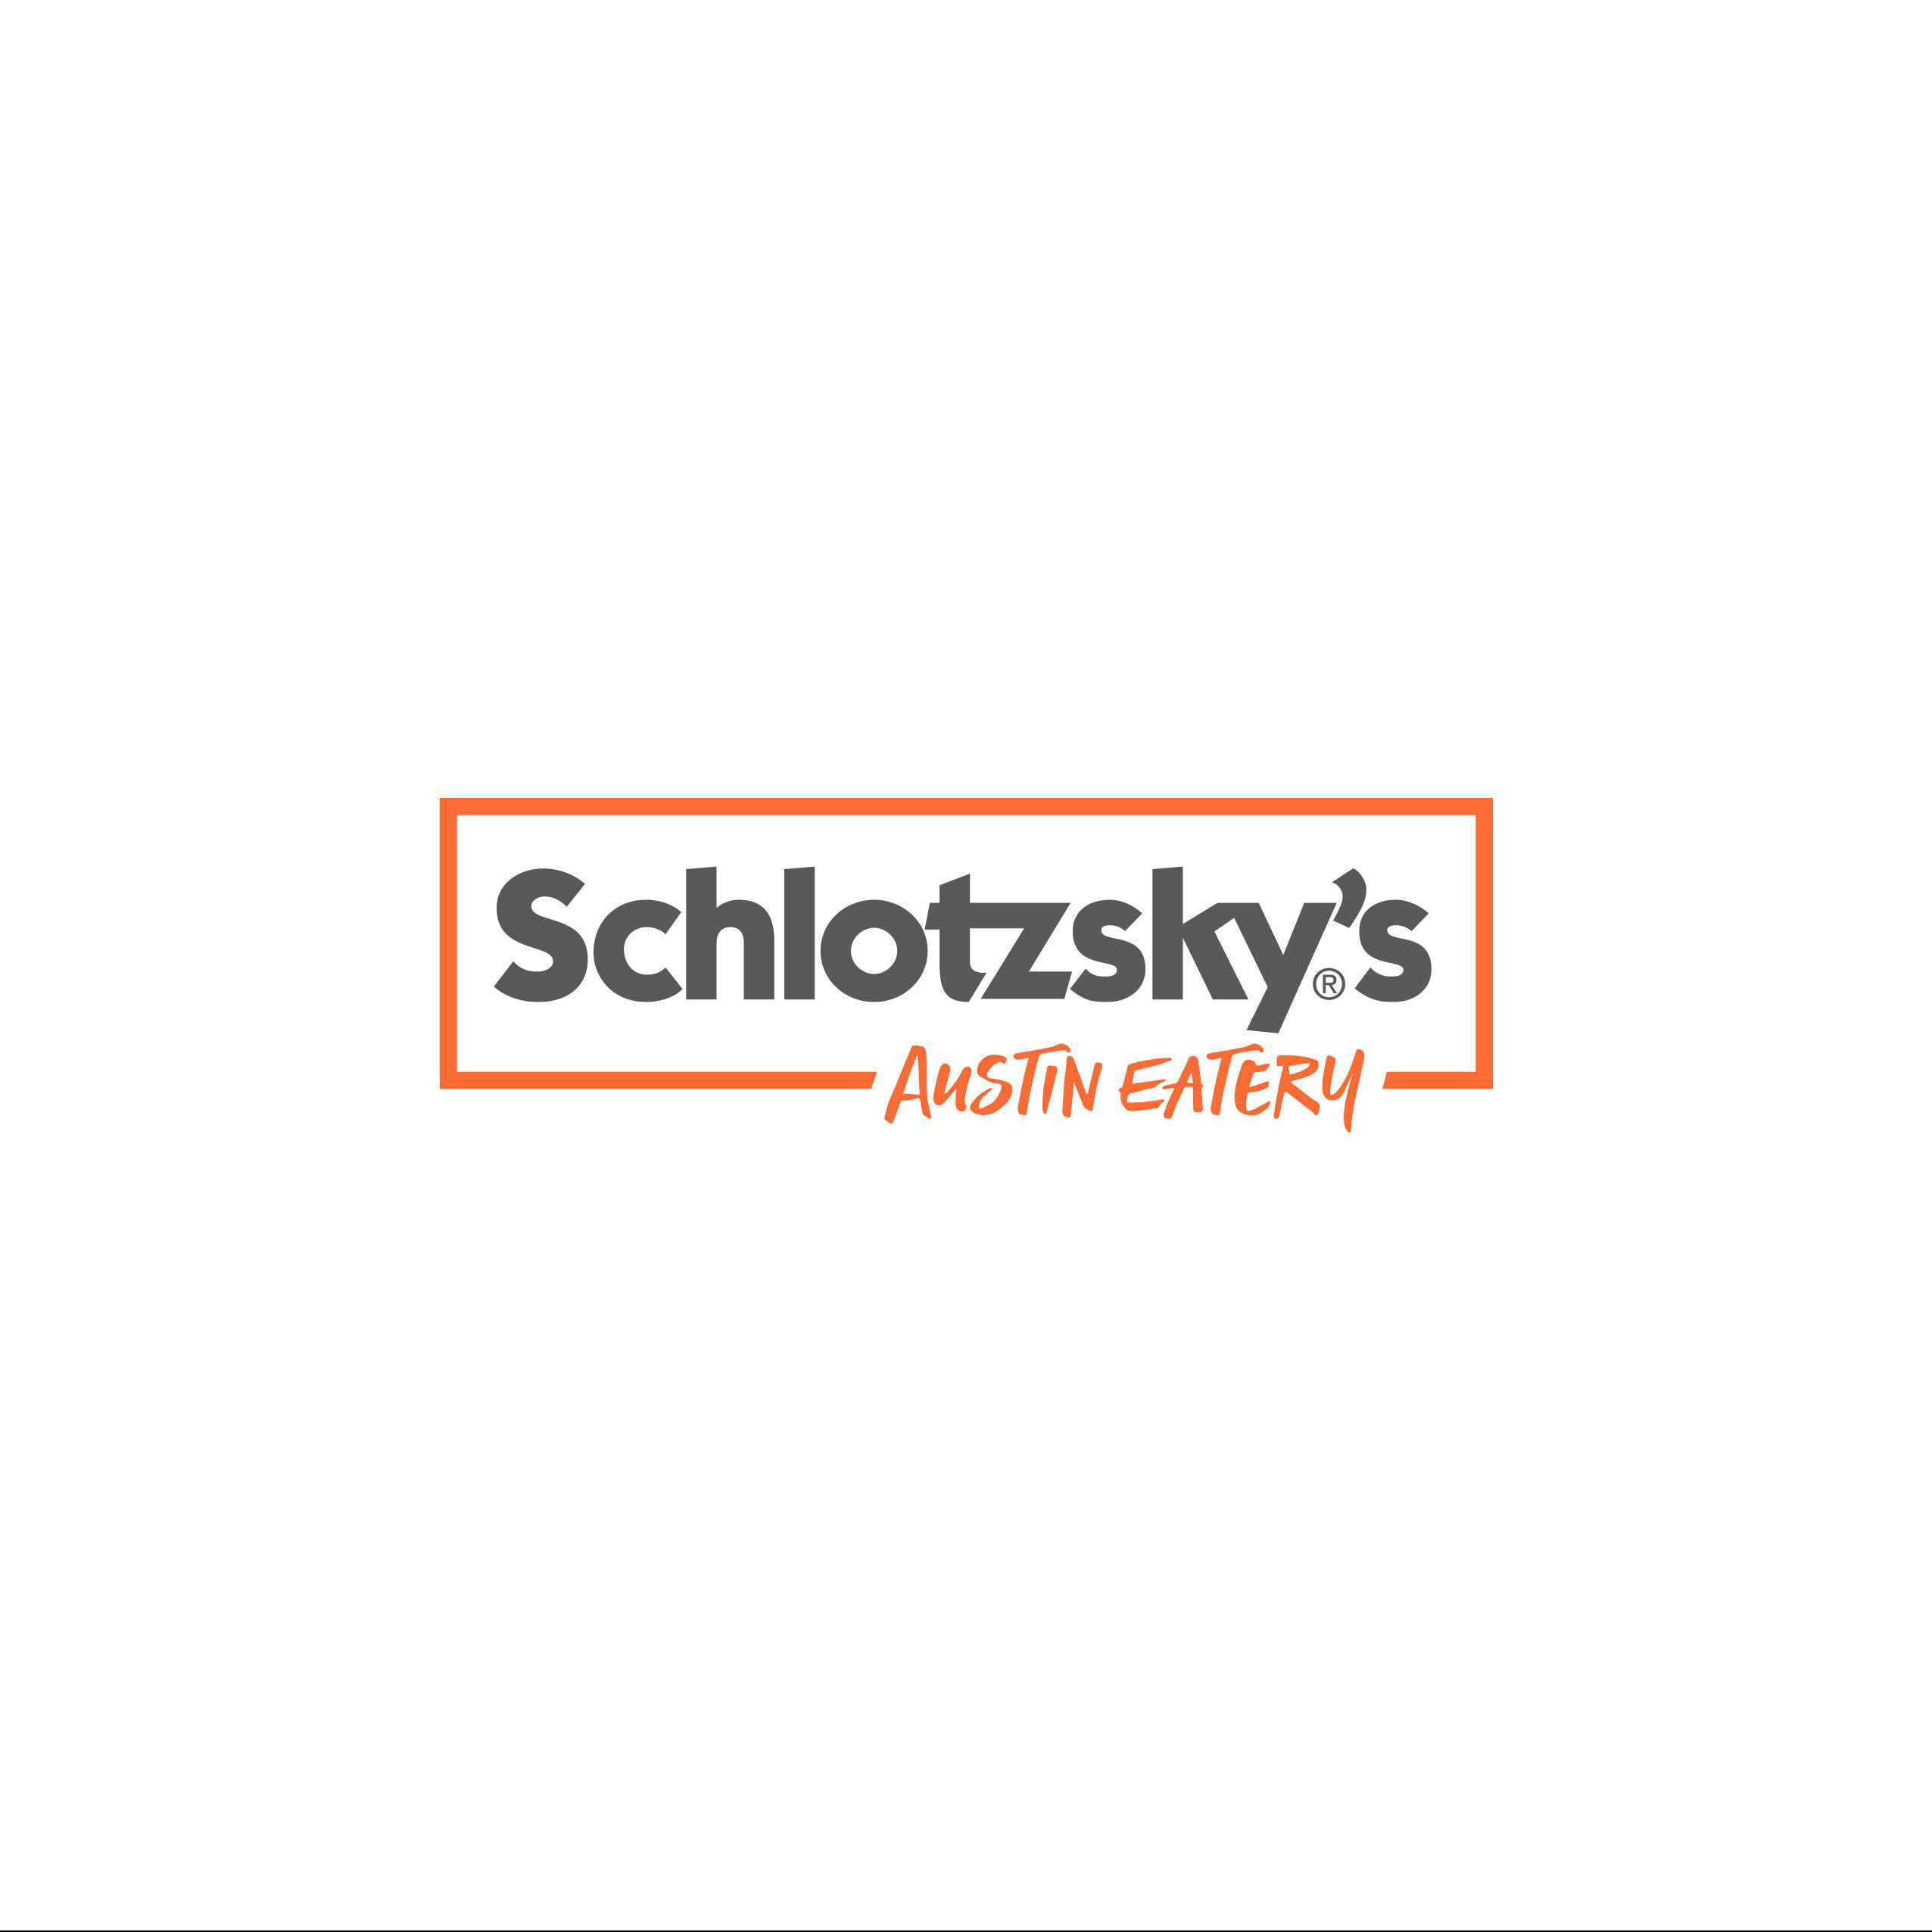 image relating to Schlotzsky's Printable Menu known as Schlotzskys Austin Eatery Work